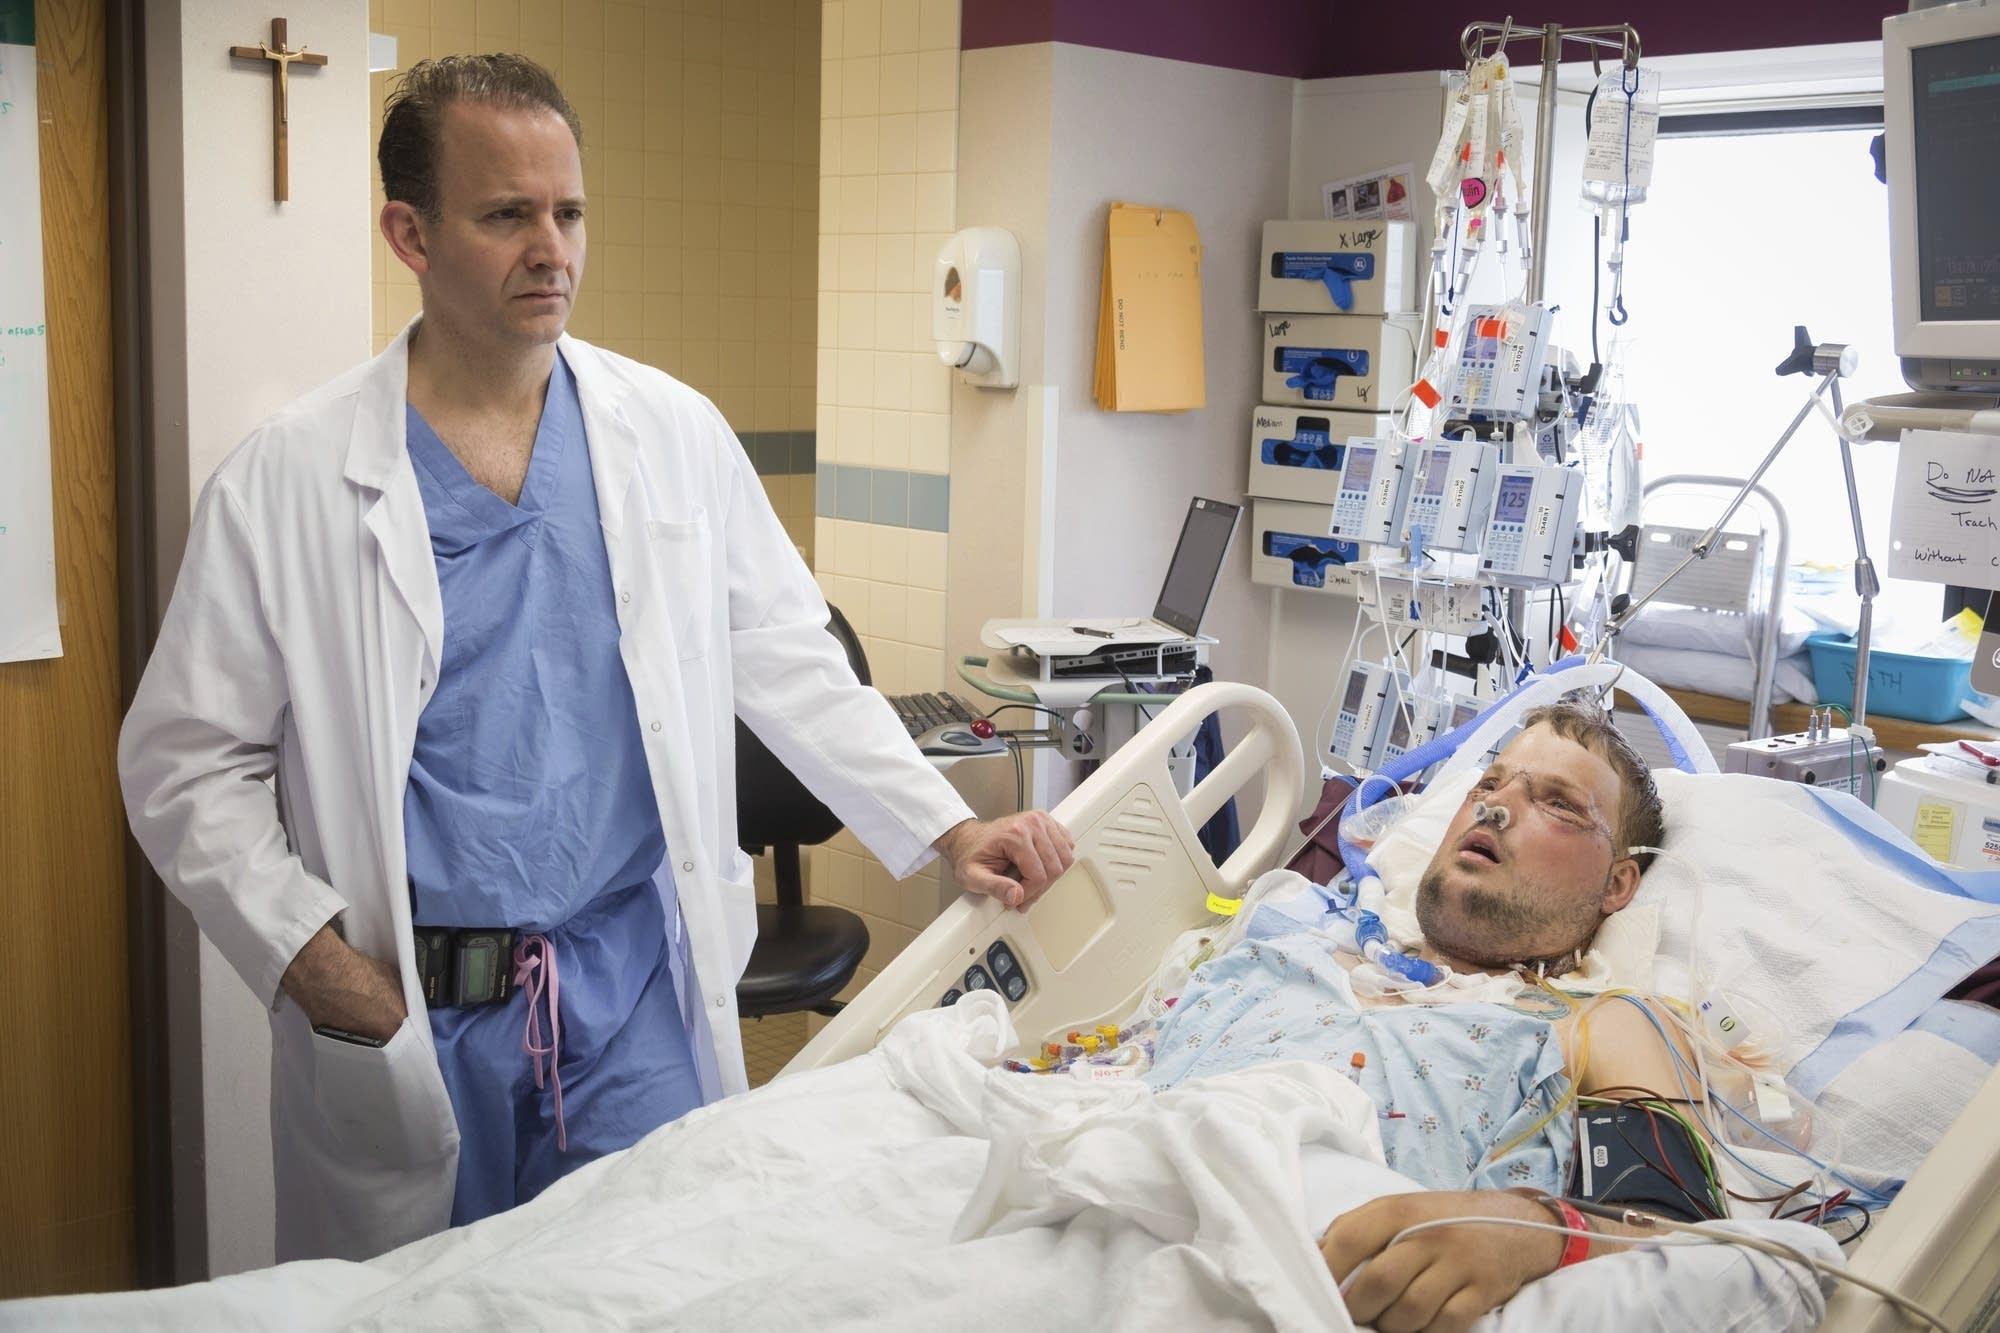 Dr. Samir Mardini checks on Andy Sandness